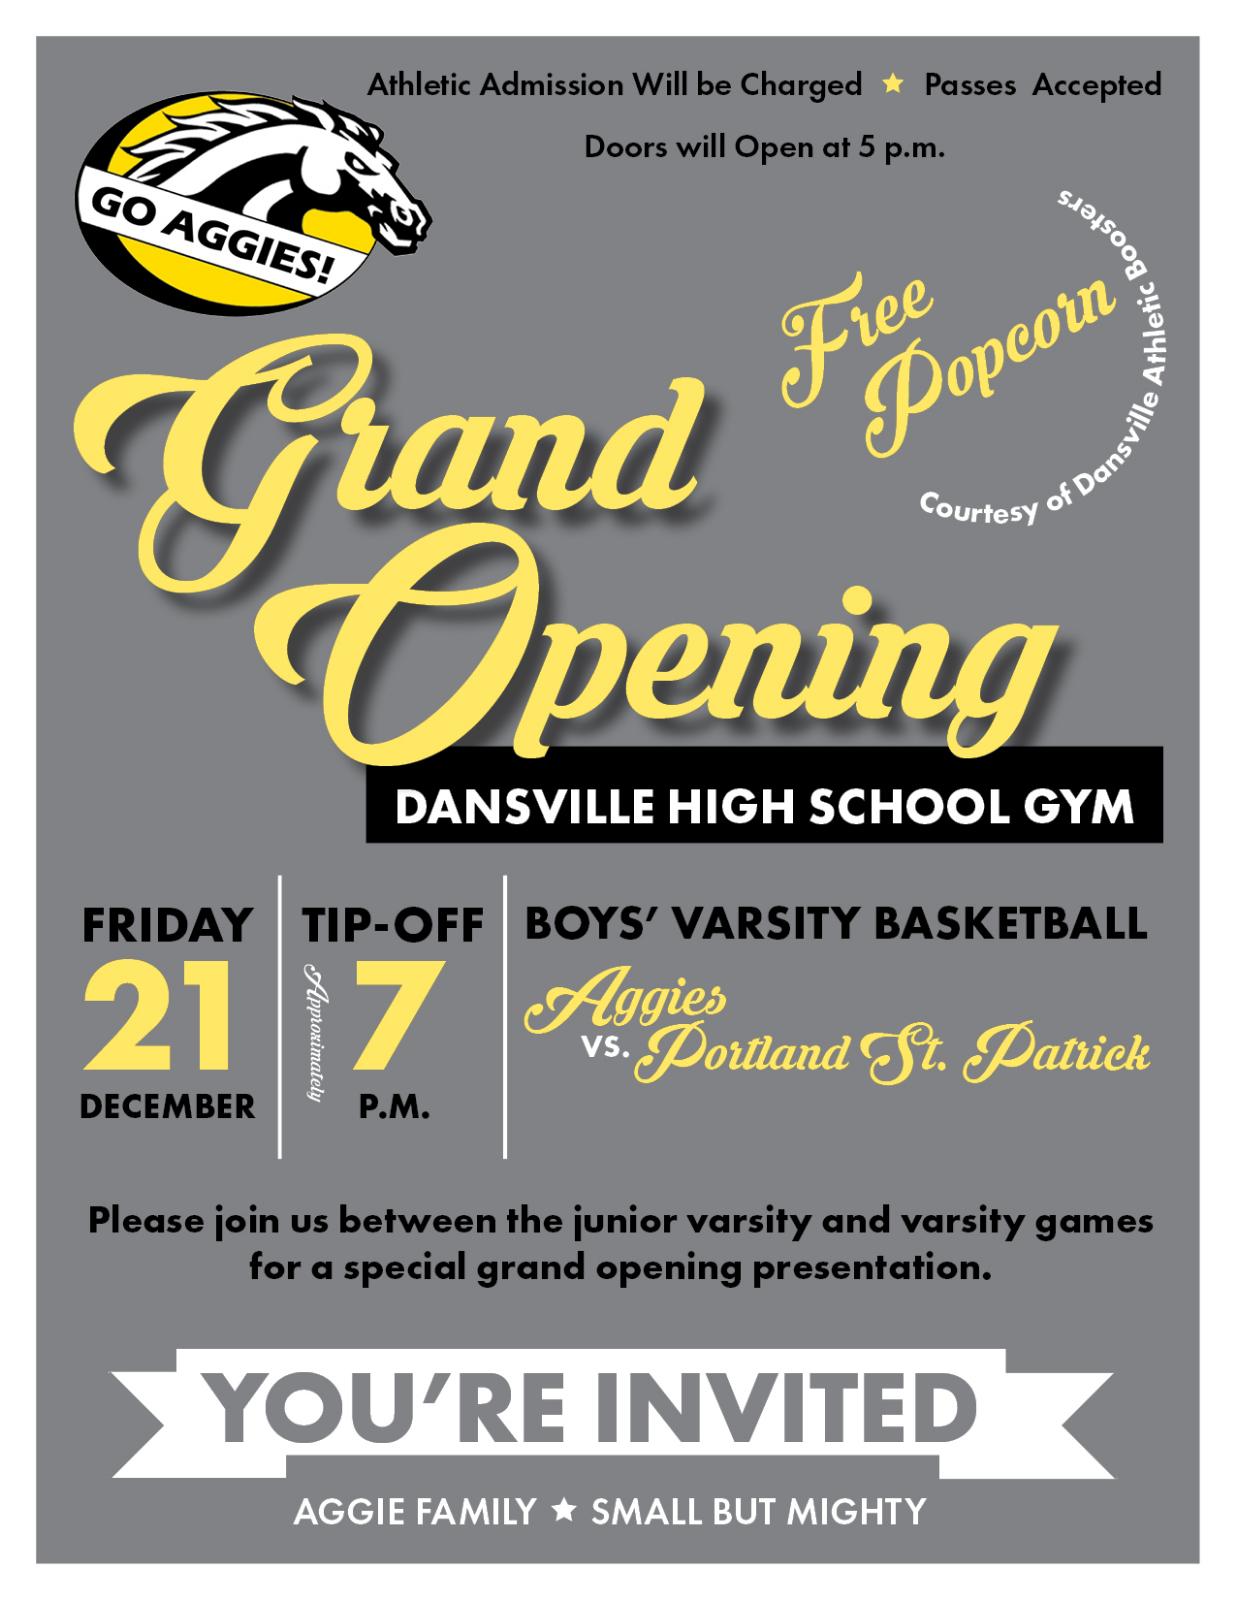 Grand Opening Dansville High School New Gym